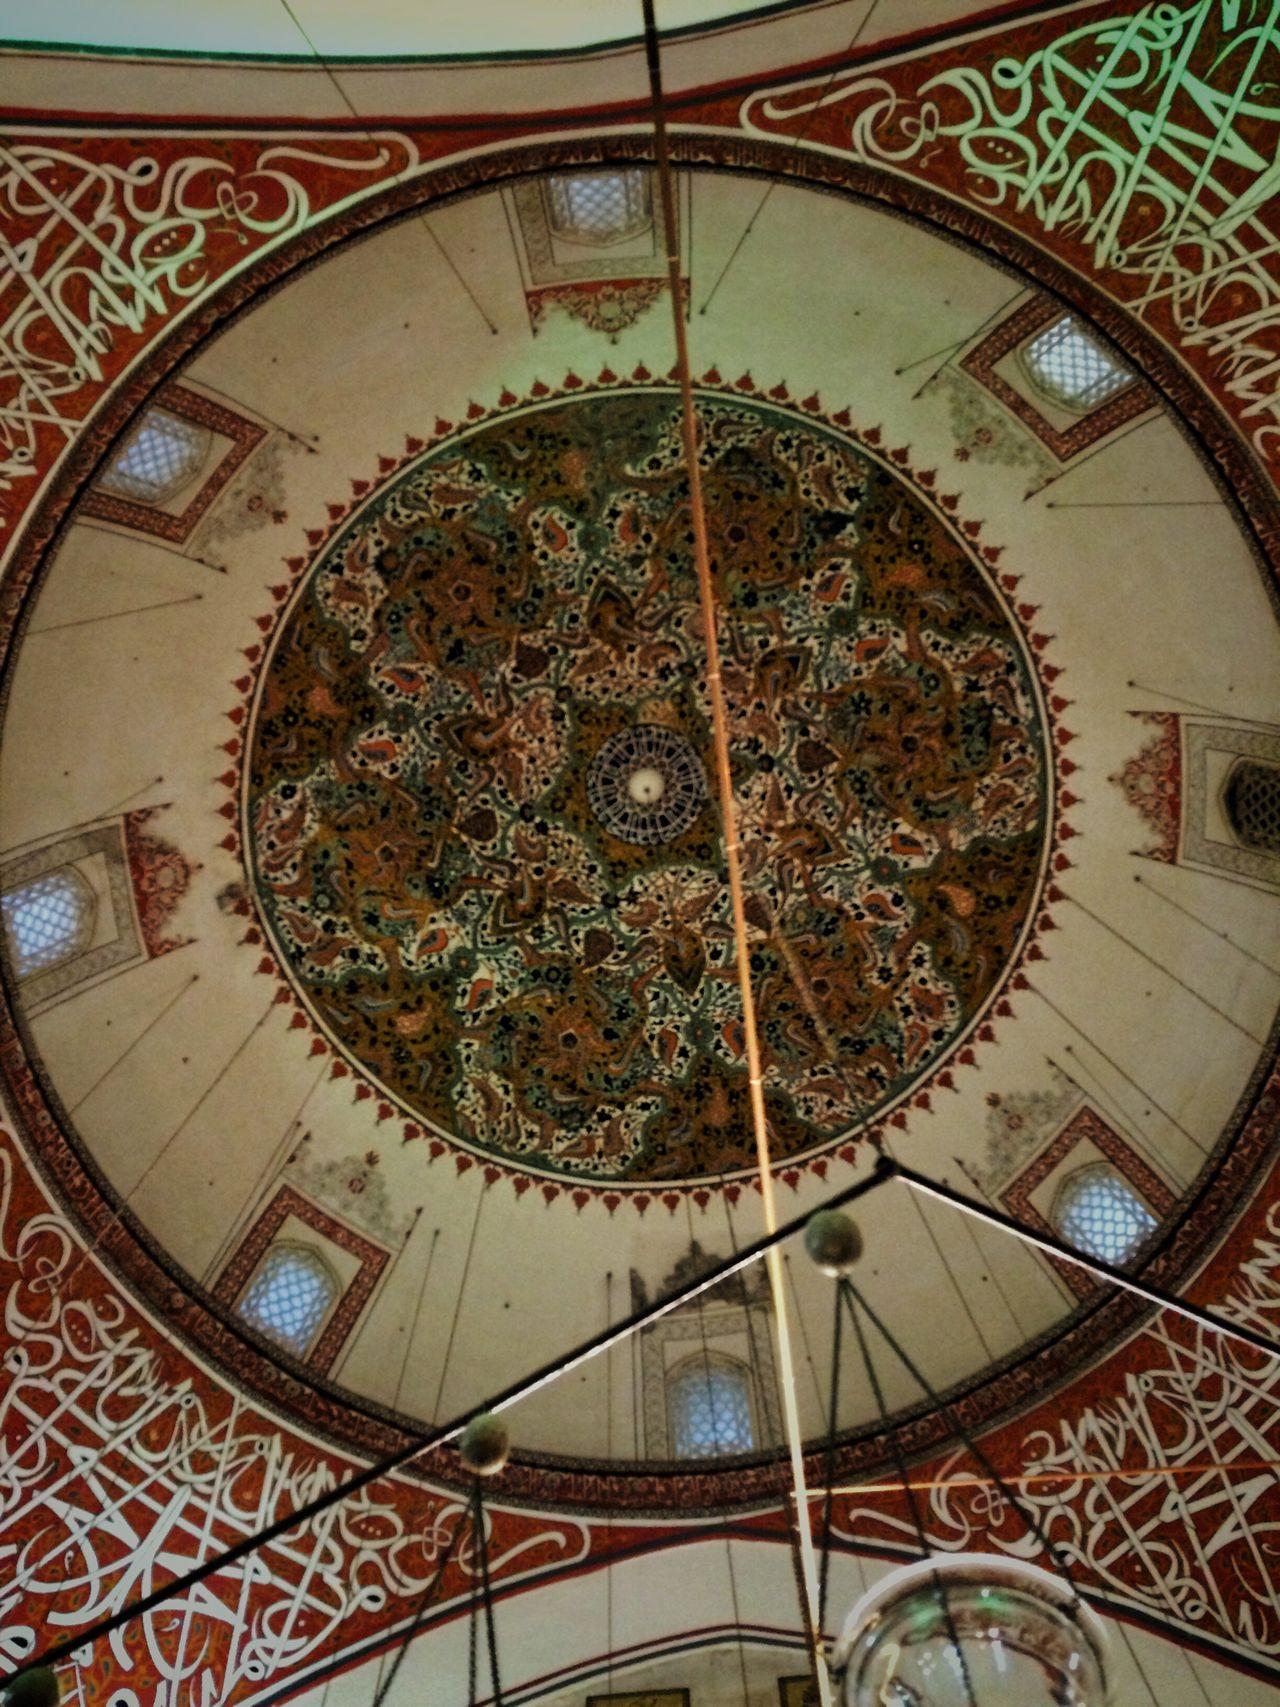 Turkey Architecture Mevlana Türbesi Mevlana Mosque Konya Turkey City Konya Love ♥